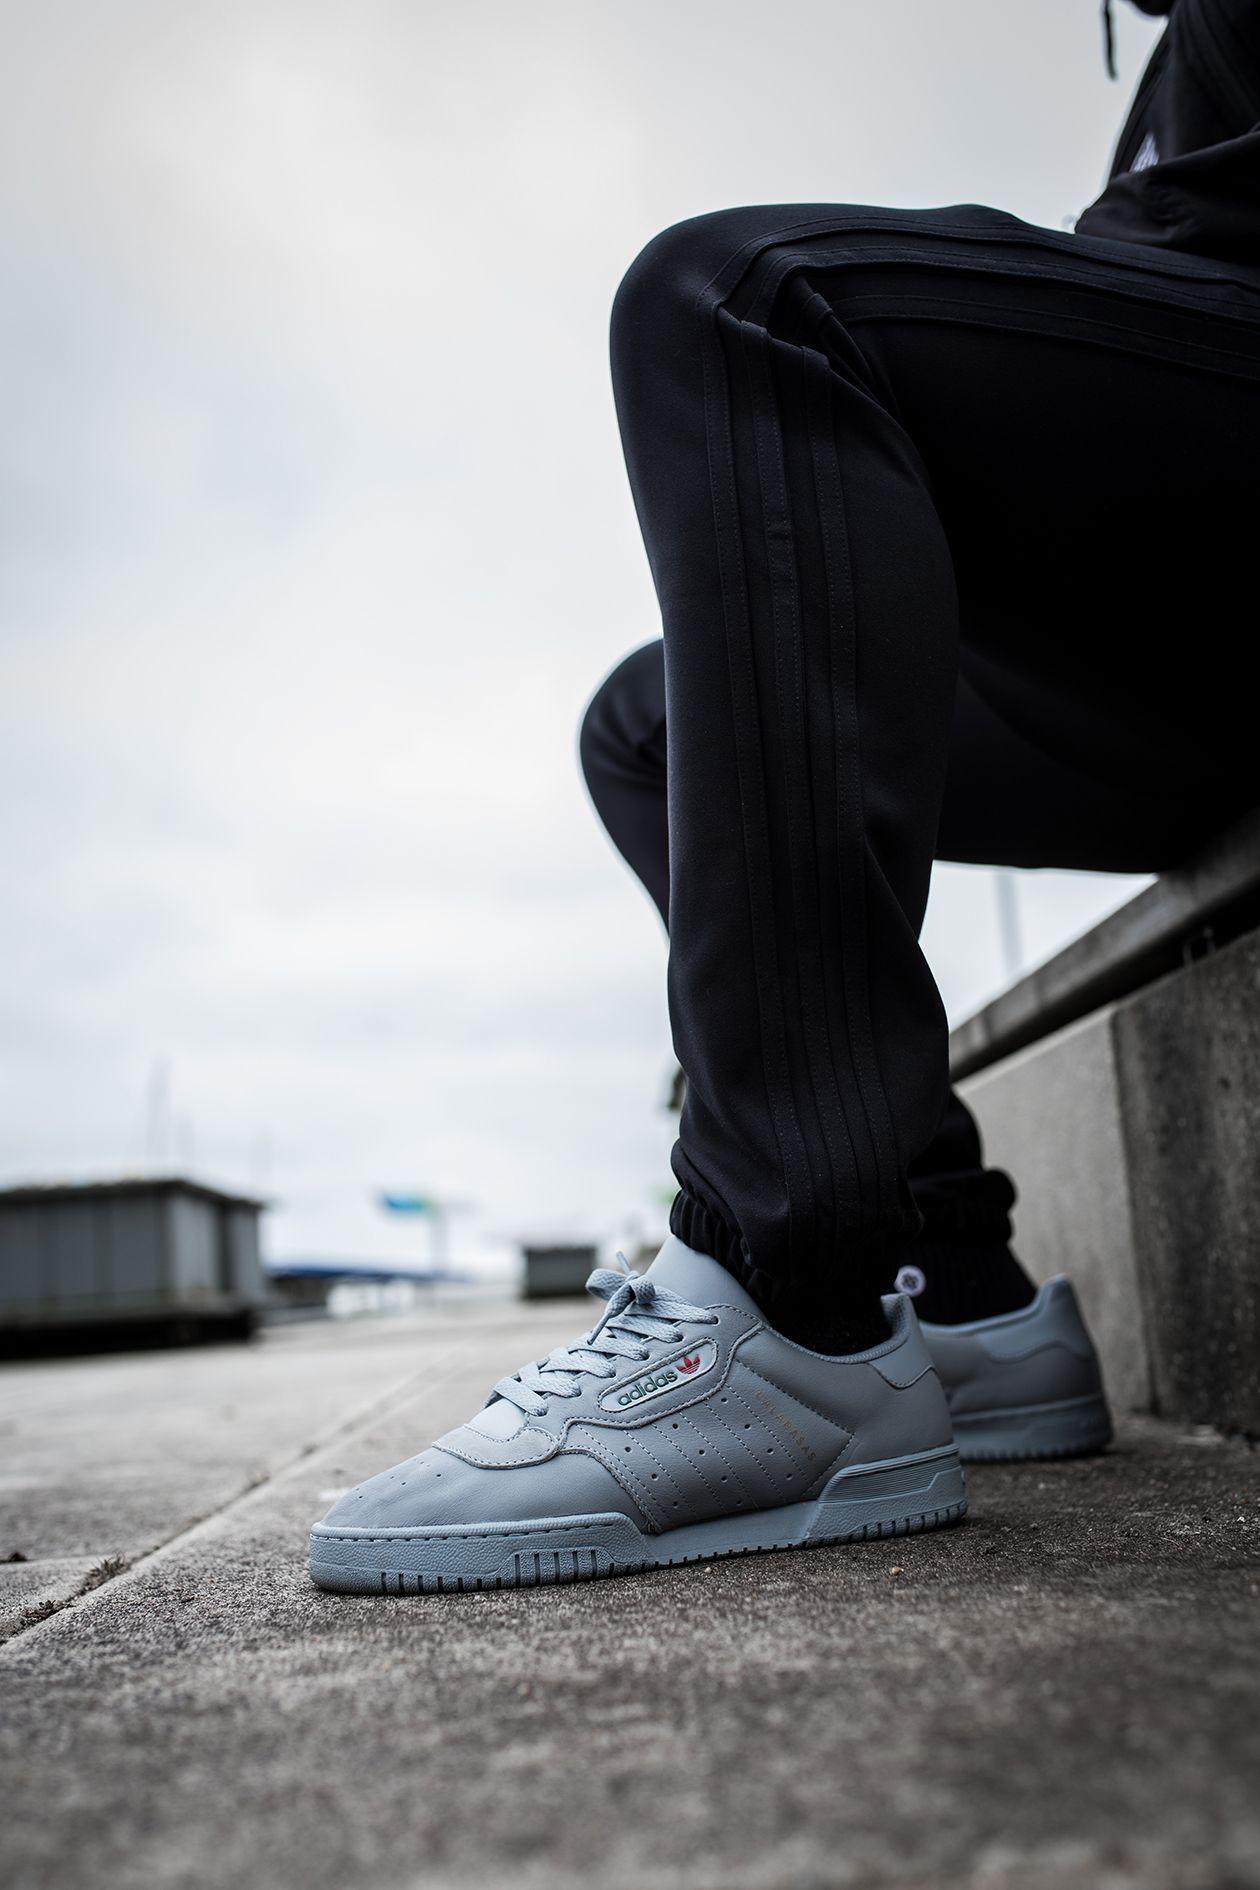 check out 06212 b8ae8 Adidas Yeezy Powerphase Calabasas Grey